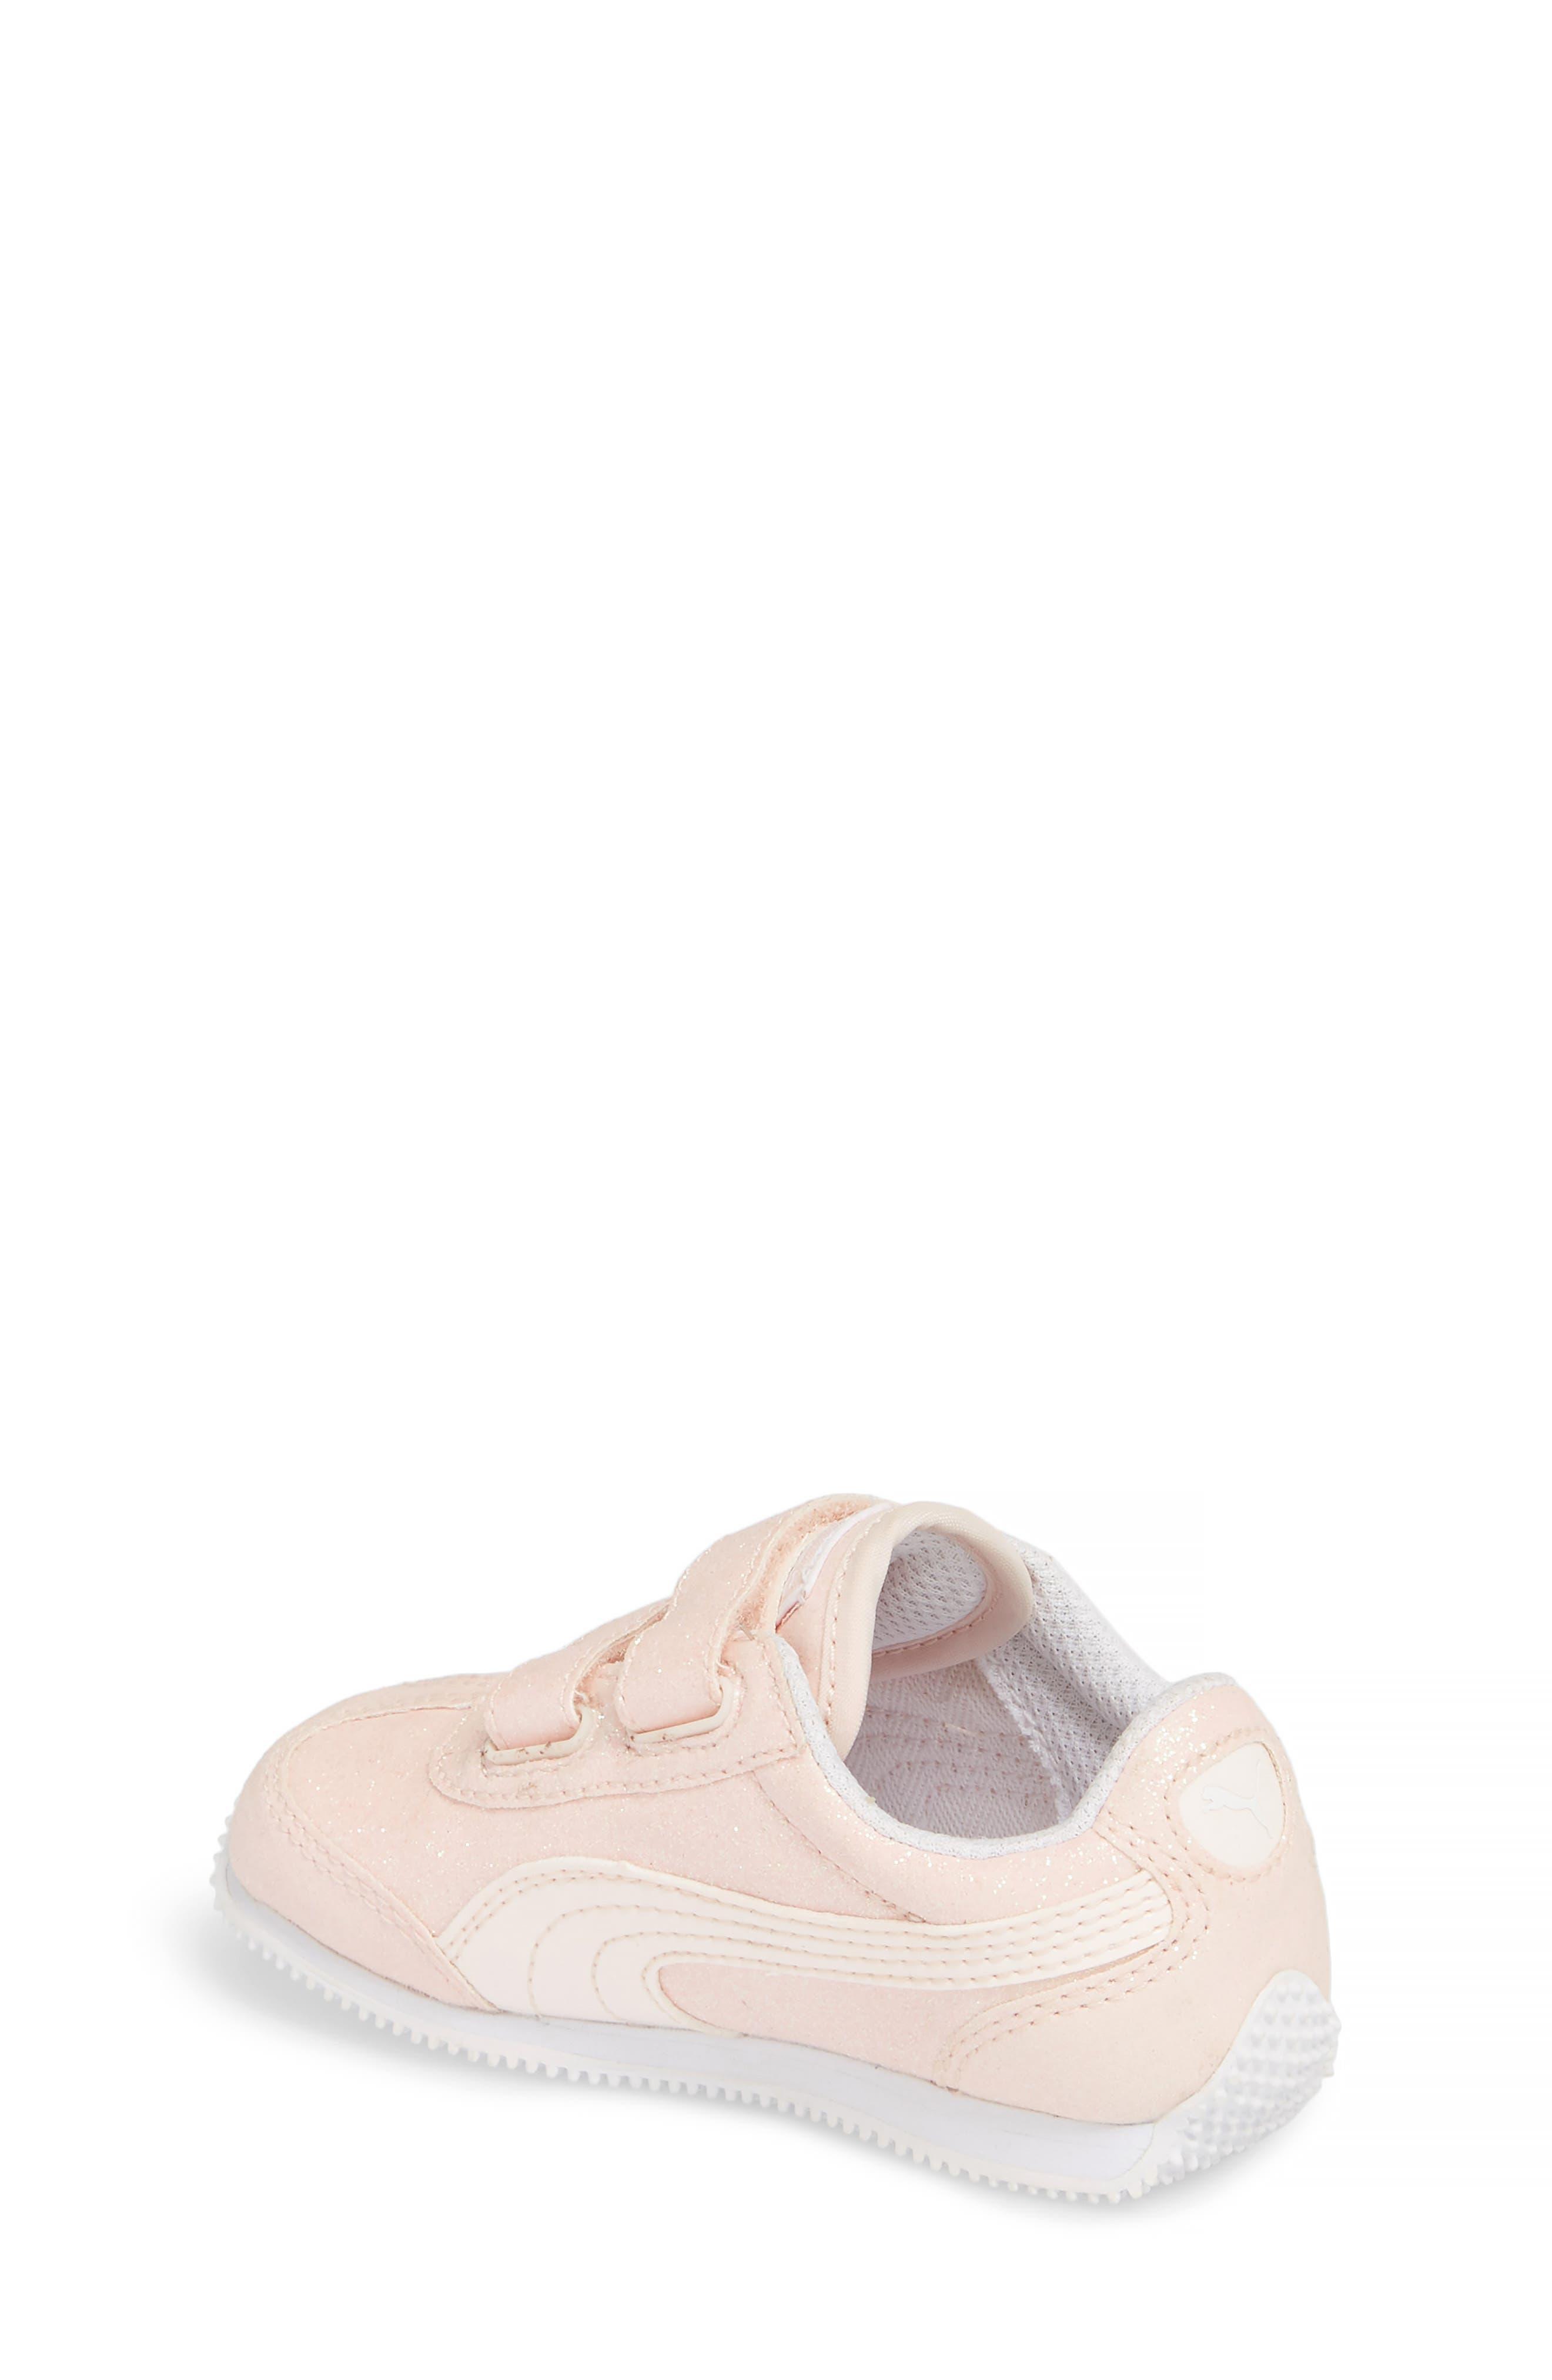 Whirlwind Glitz Sneaker,                             Alternate thumbnail 2, color,                             PEARL/ PUMA WHITE